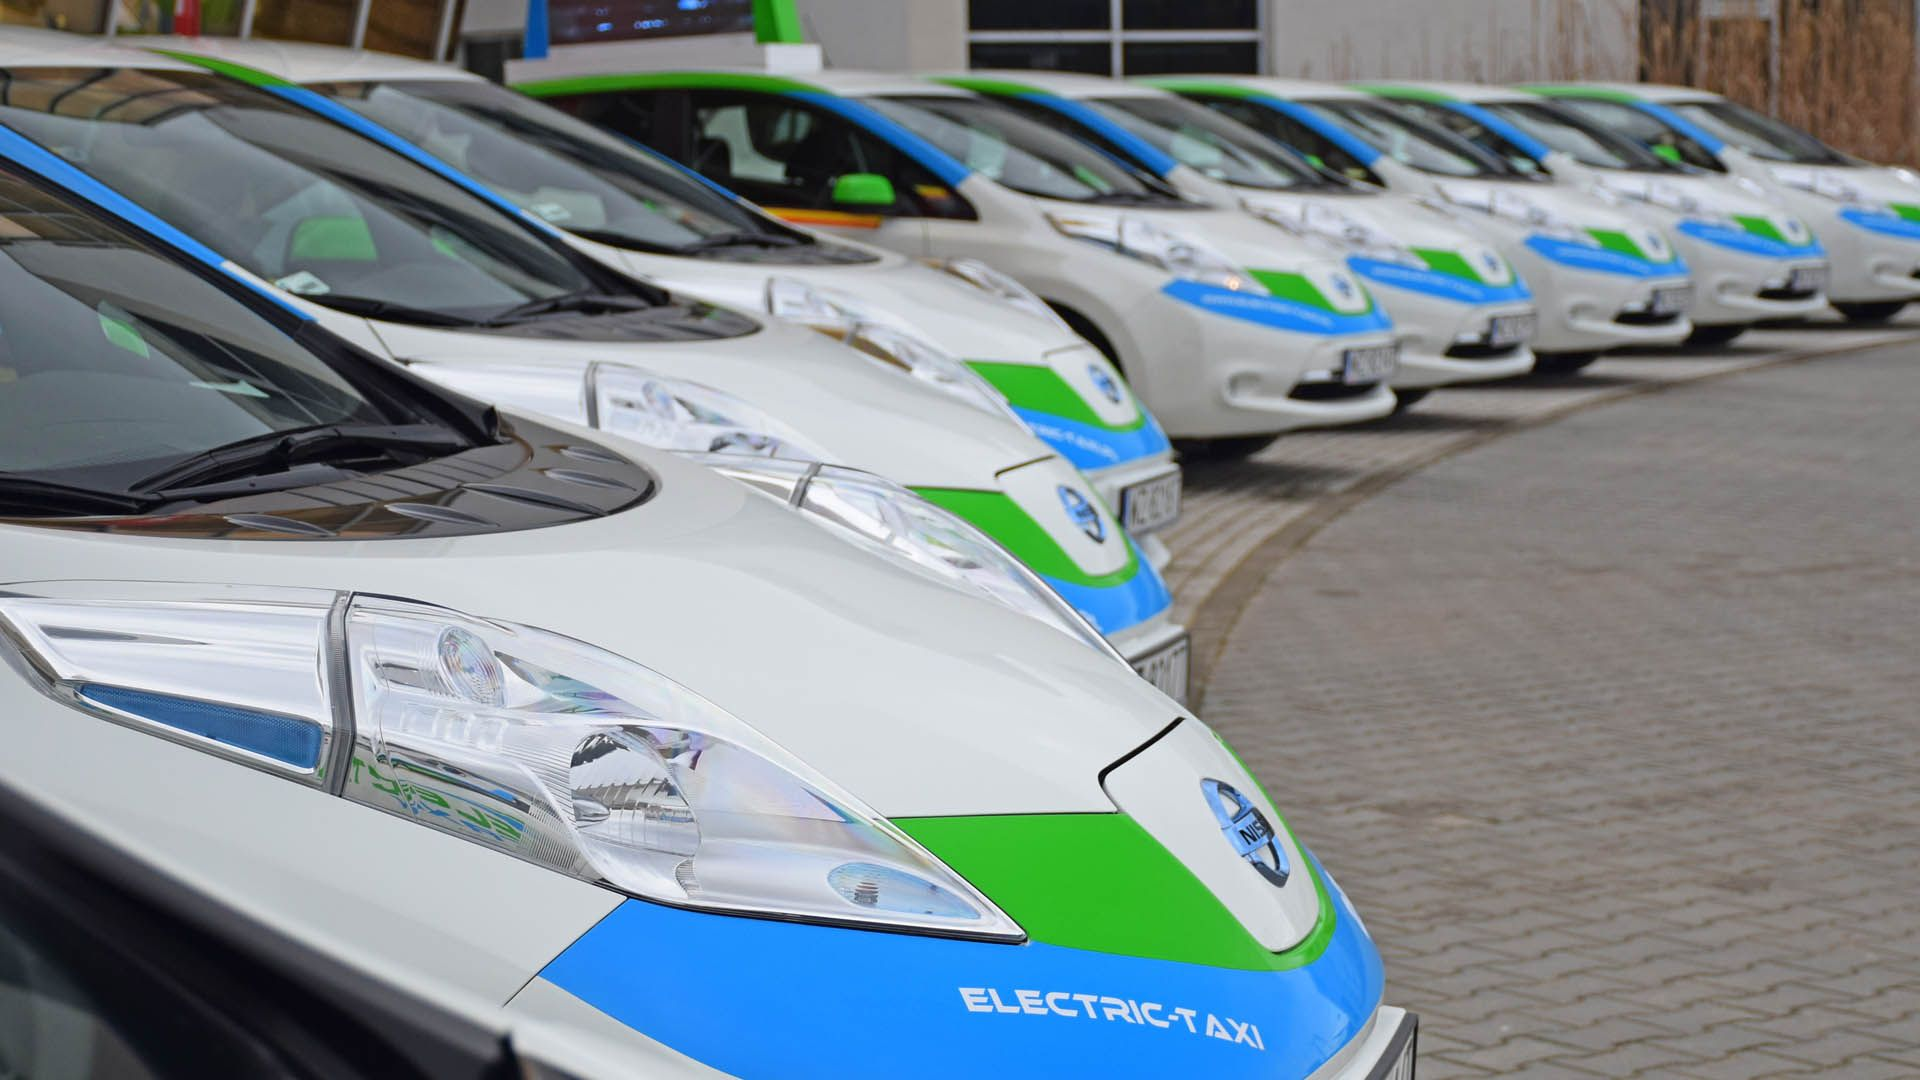 Pin by Lobagola MotoTours on Fleet insurance Car tour